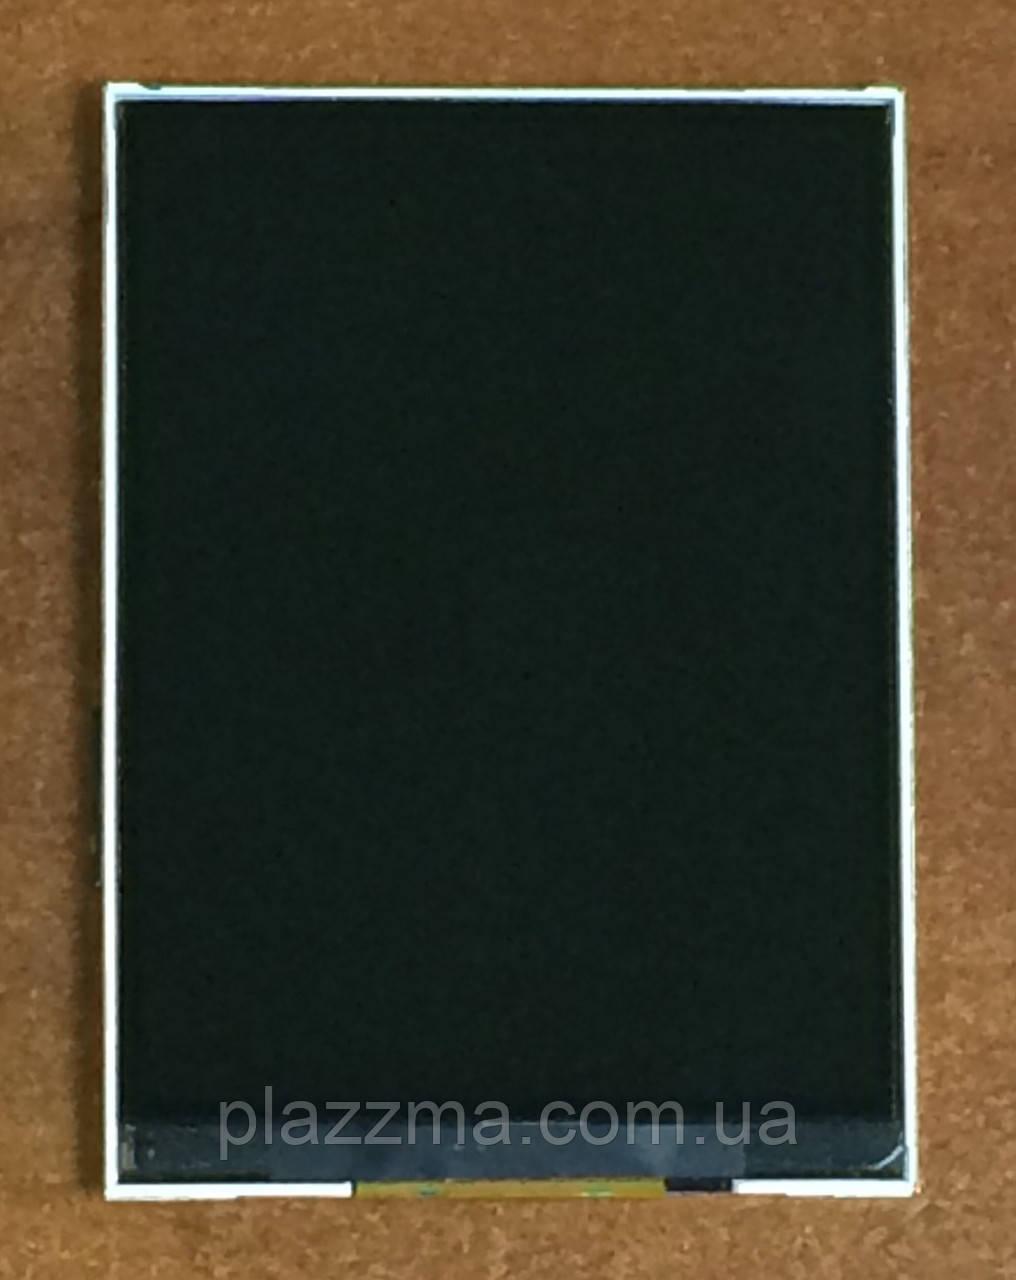 Дисплей LG Optimus L3